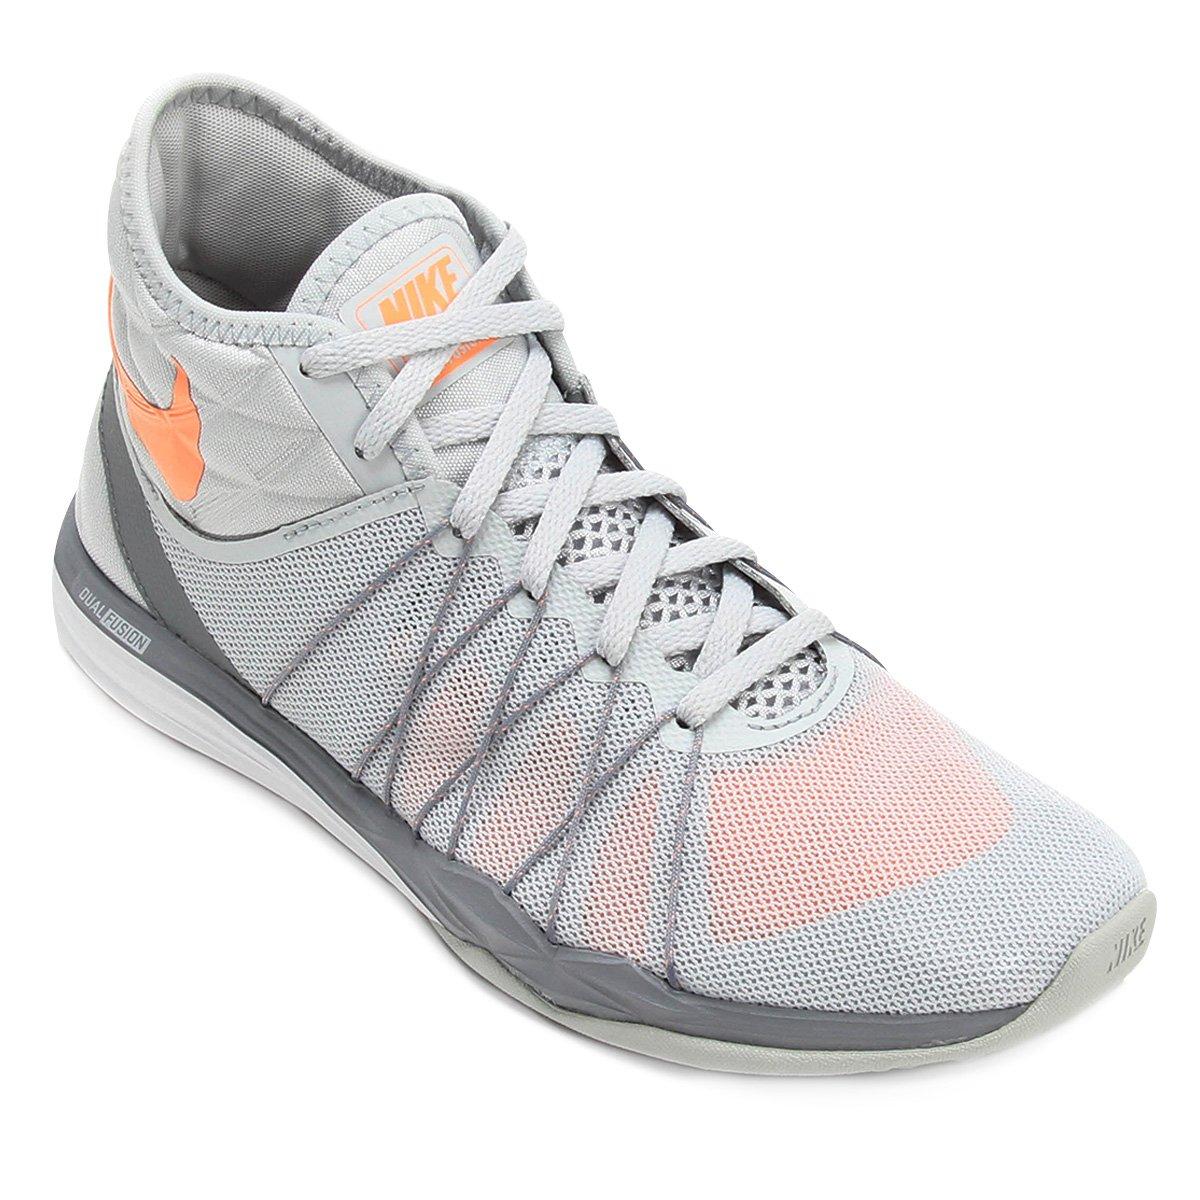 d0bcdd2a9 Tênis Nike Dual Fusion TR Hit Feminino - Cinza e Laranja | Shop Timão